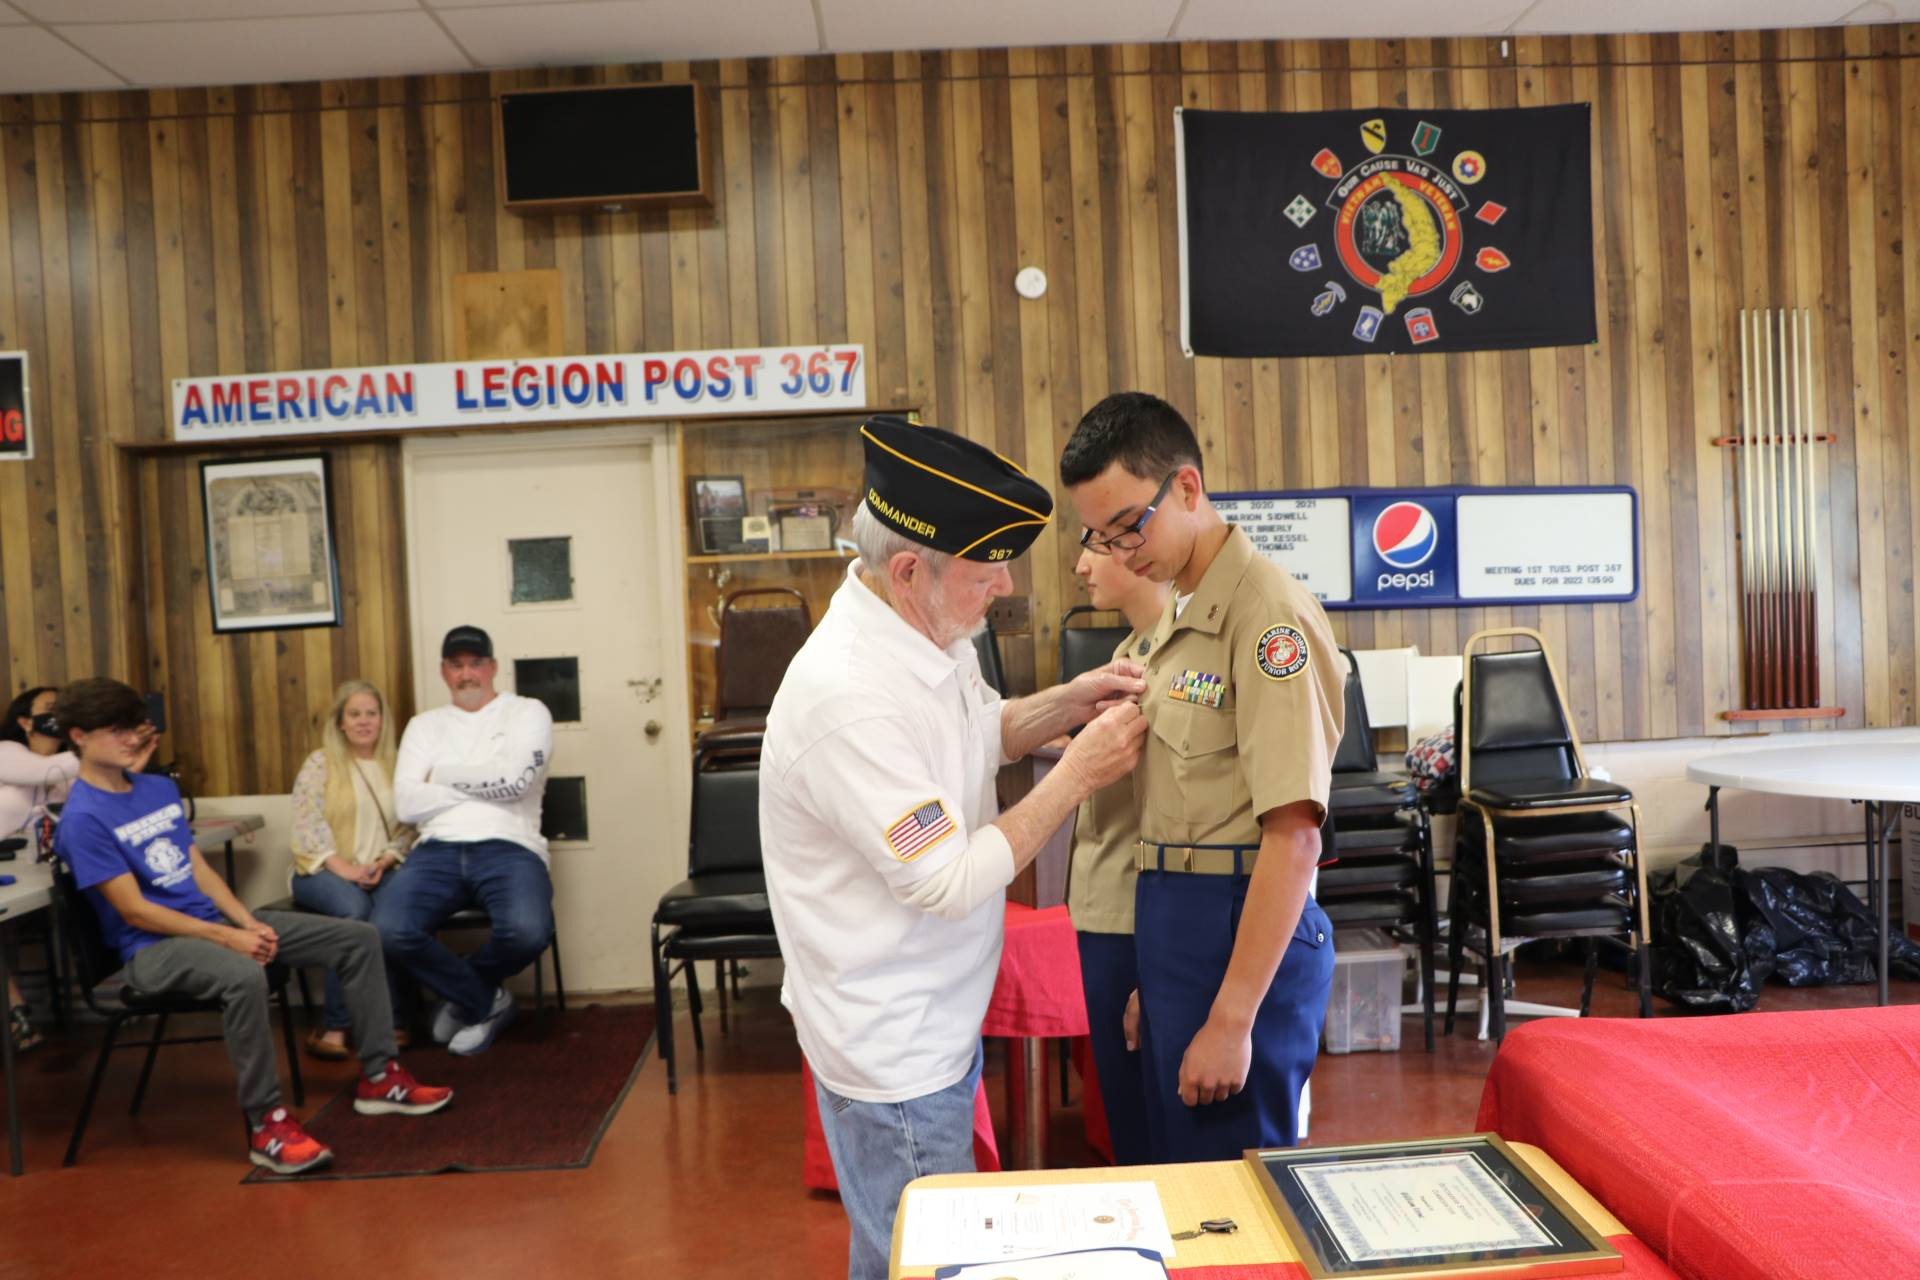 Cadet Joseph Castle receives the American Legion Scholastic Award